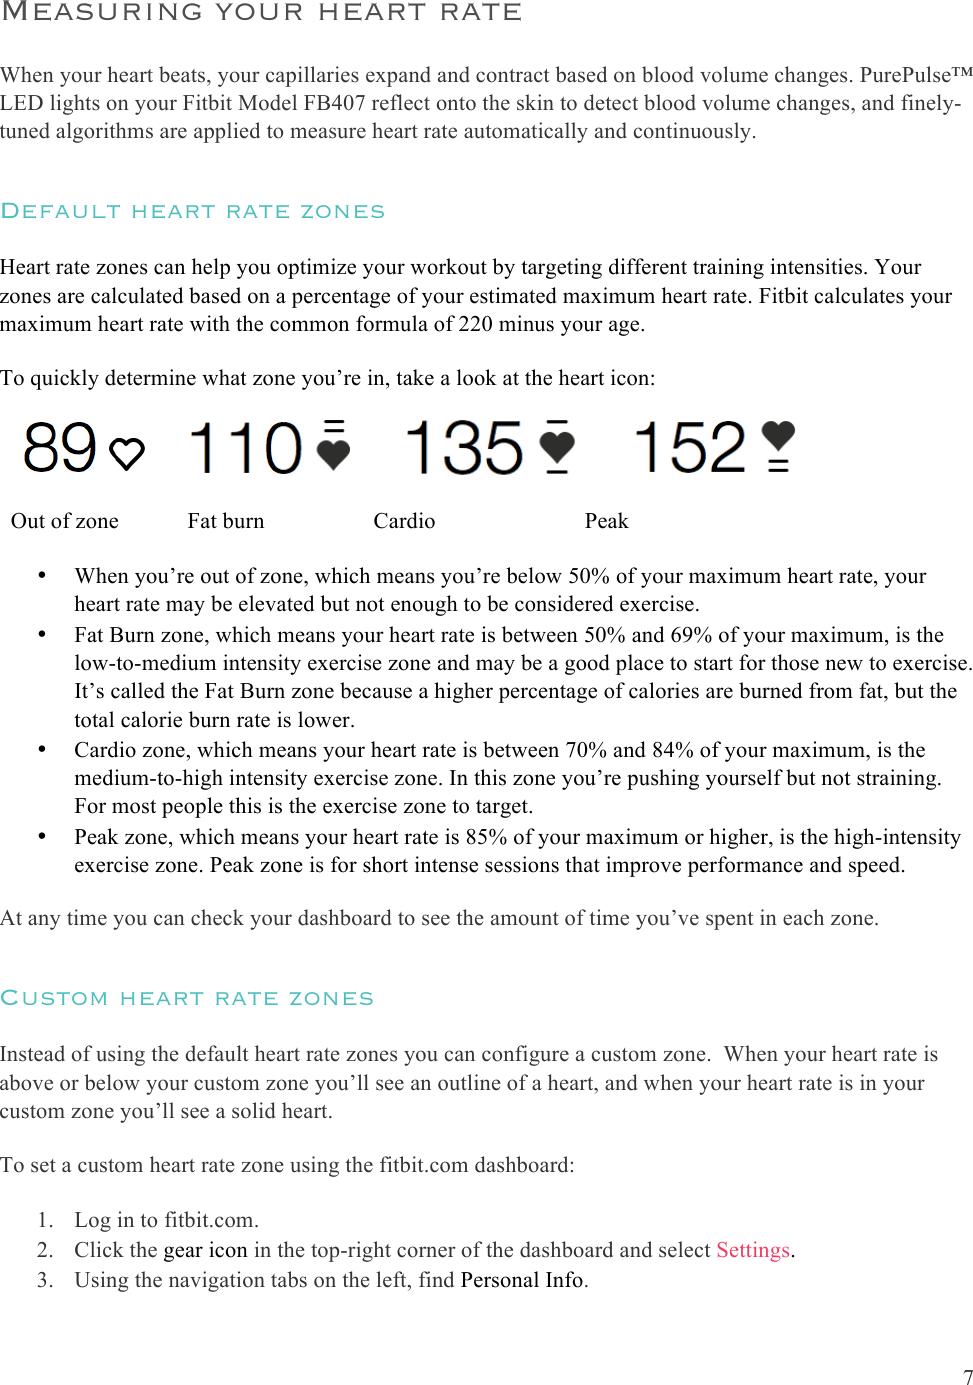 teslasz fitness tracker user manual